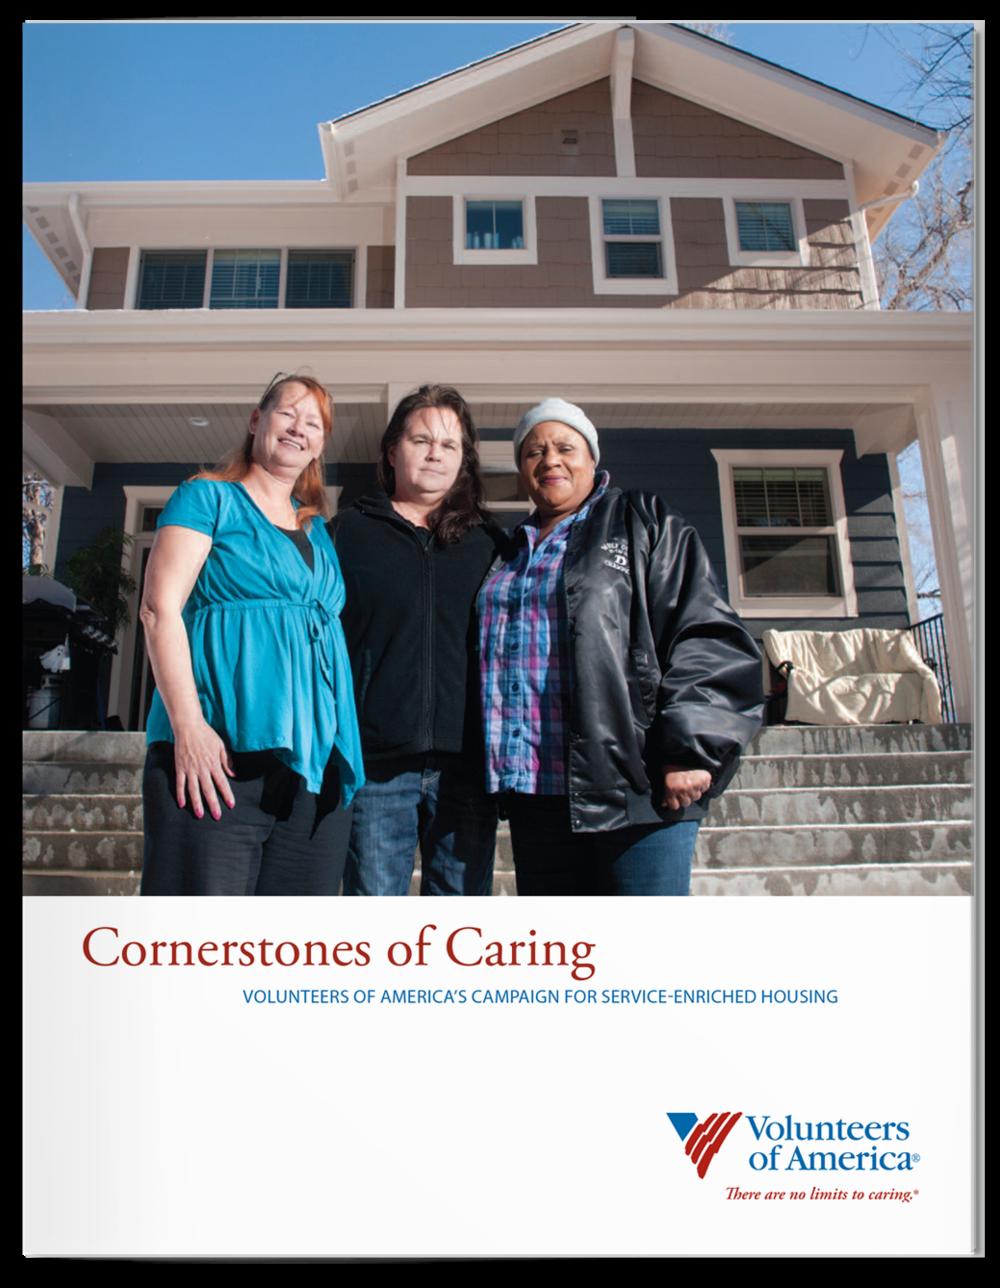 VOA service housing